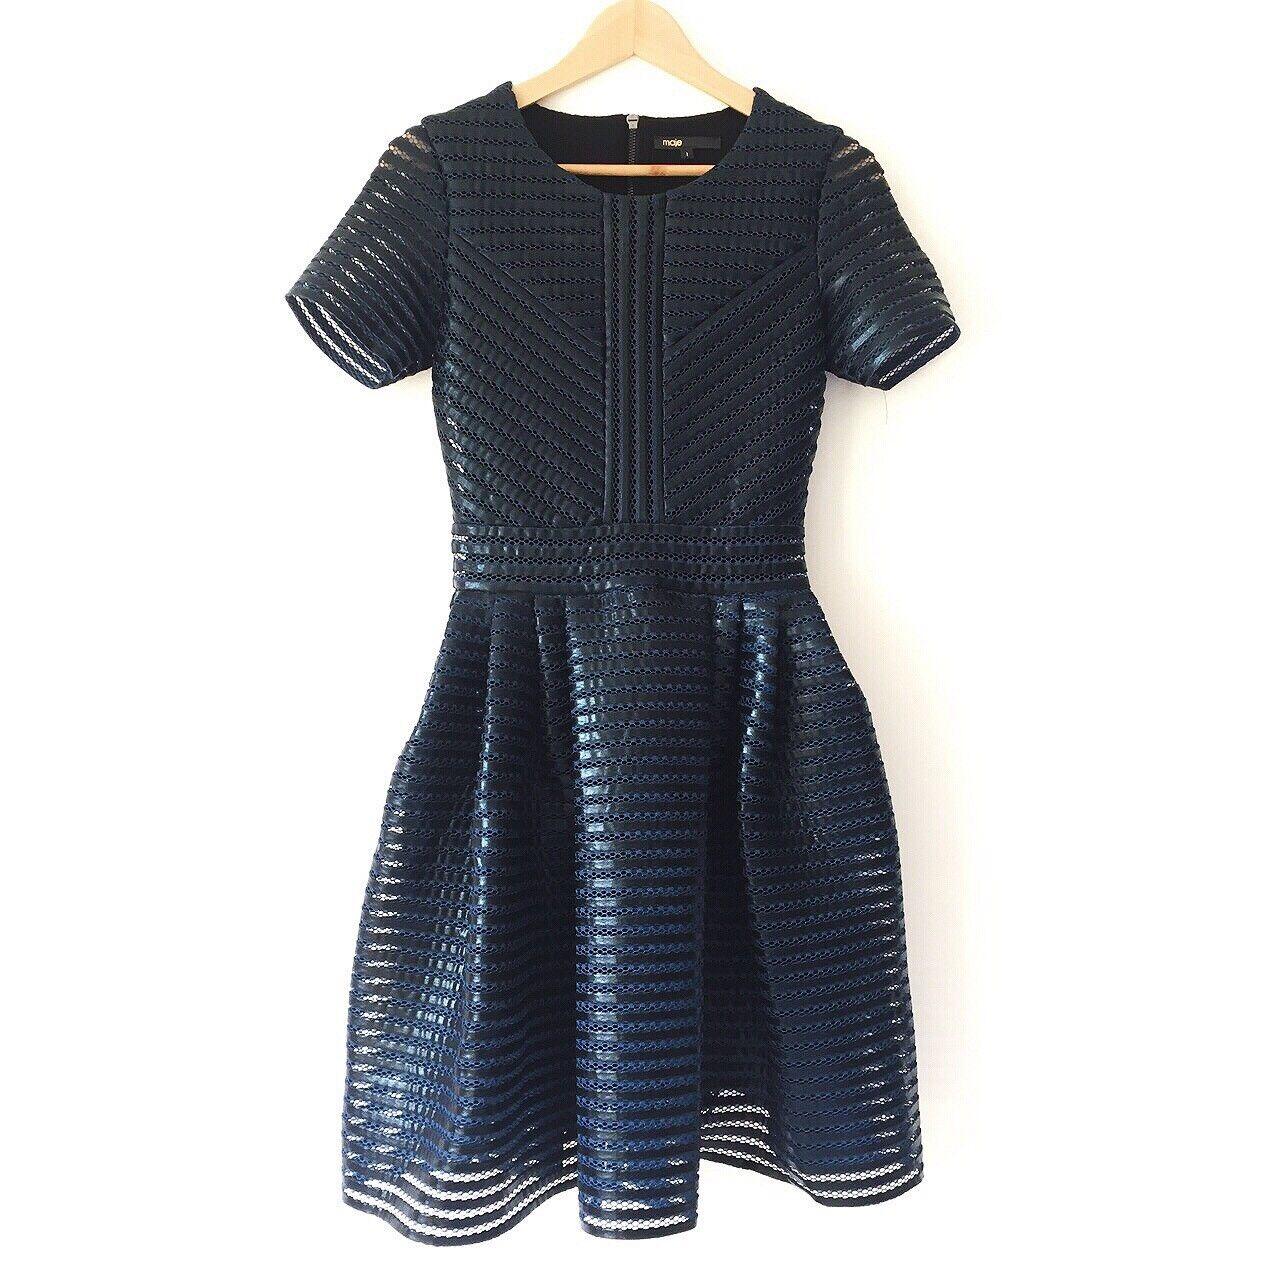 4414f2457170 100% Genuine Brand New bluee Roybridge Size 1 Maje Dress nqhbpe11479 ...